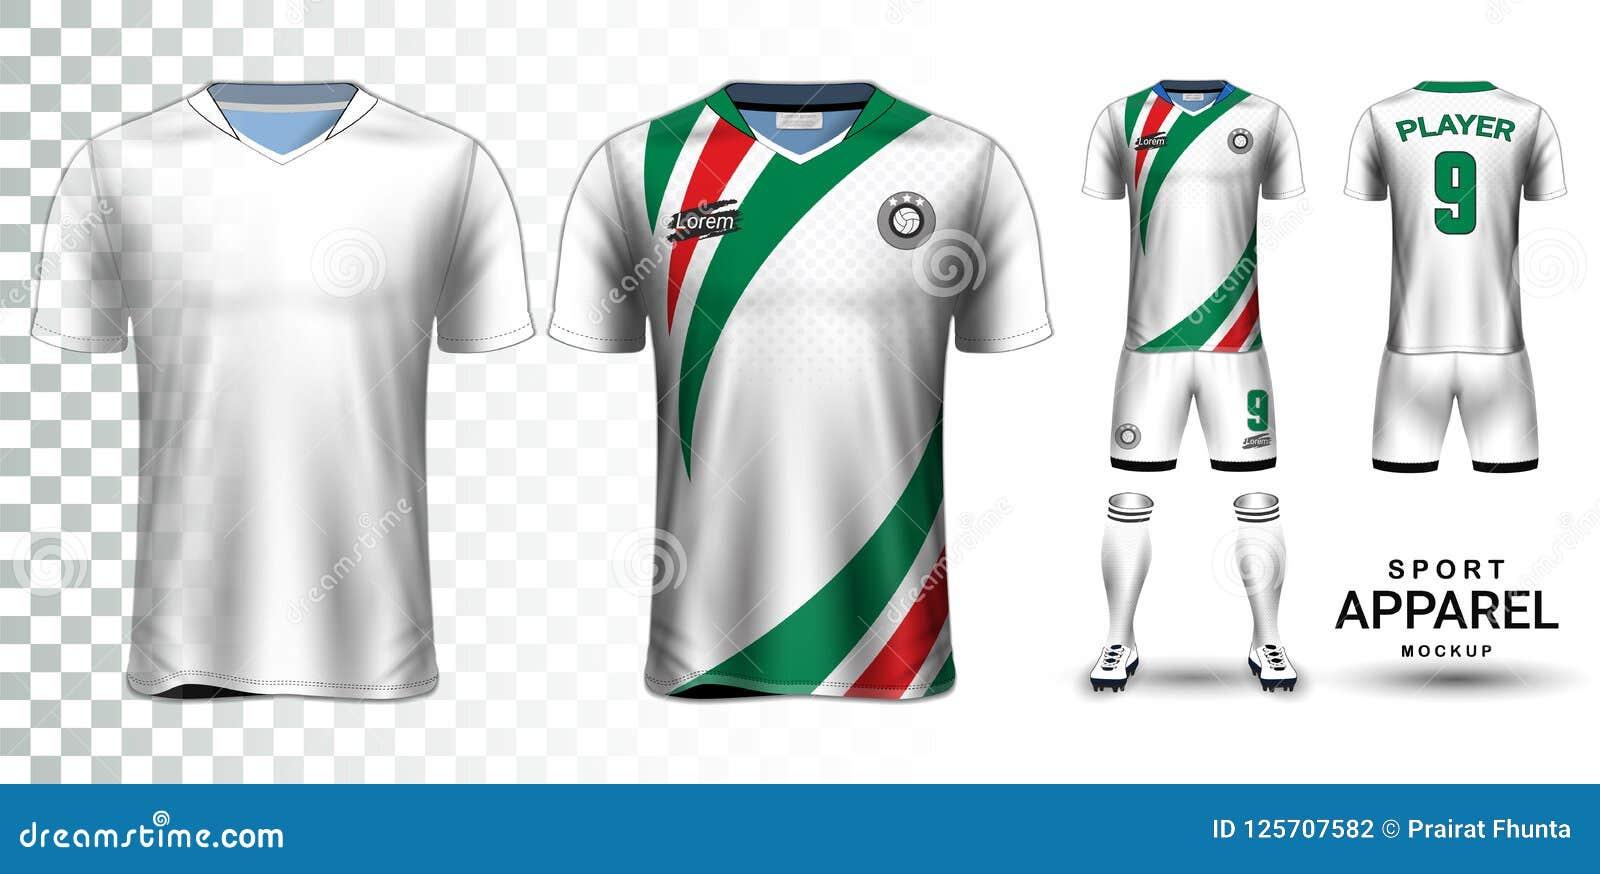 daa71eb6d Soccer Jersey And Football Kit Presentation Mockup Template Stock ...